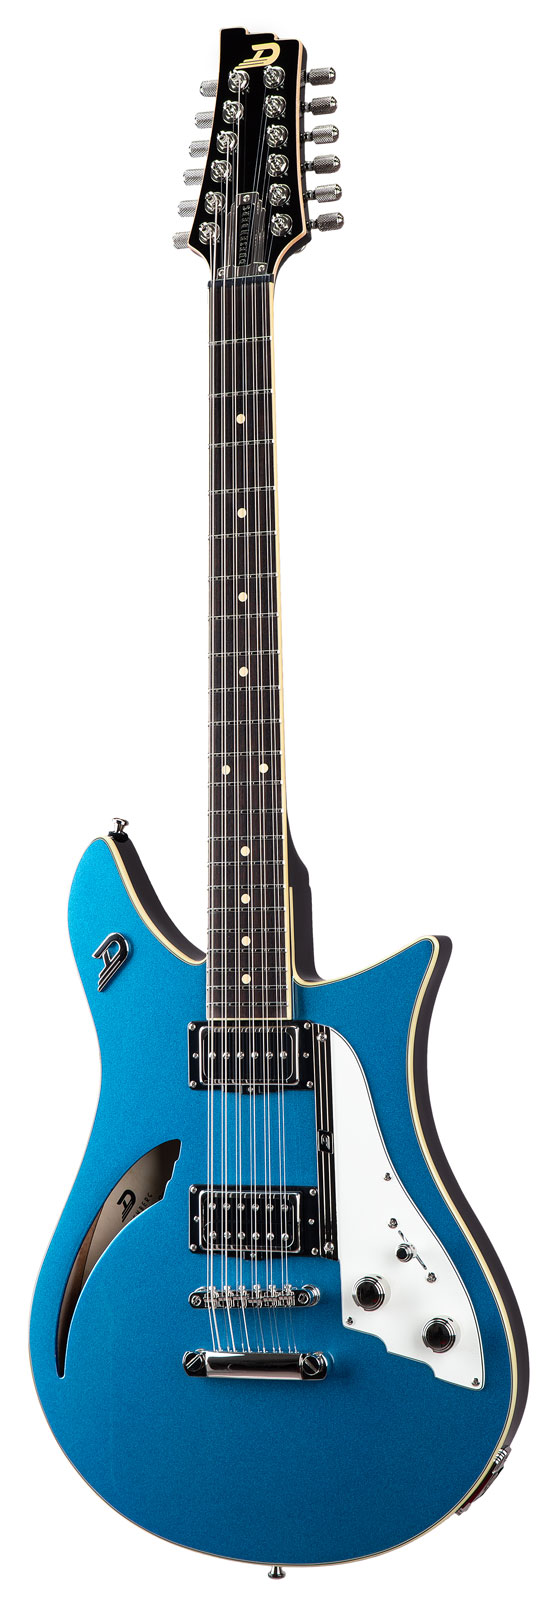 Duesenberg Double Cat 12-string Catalina Blue